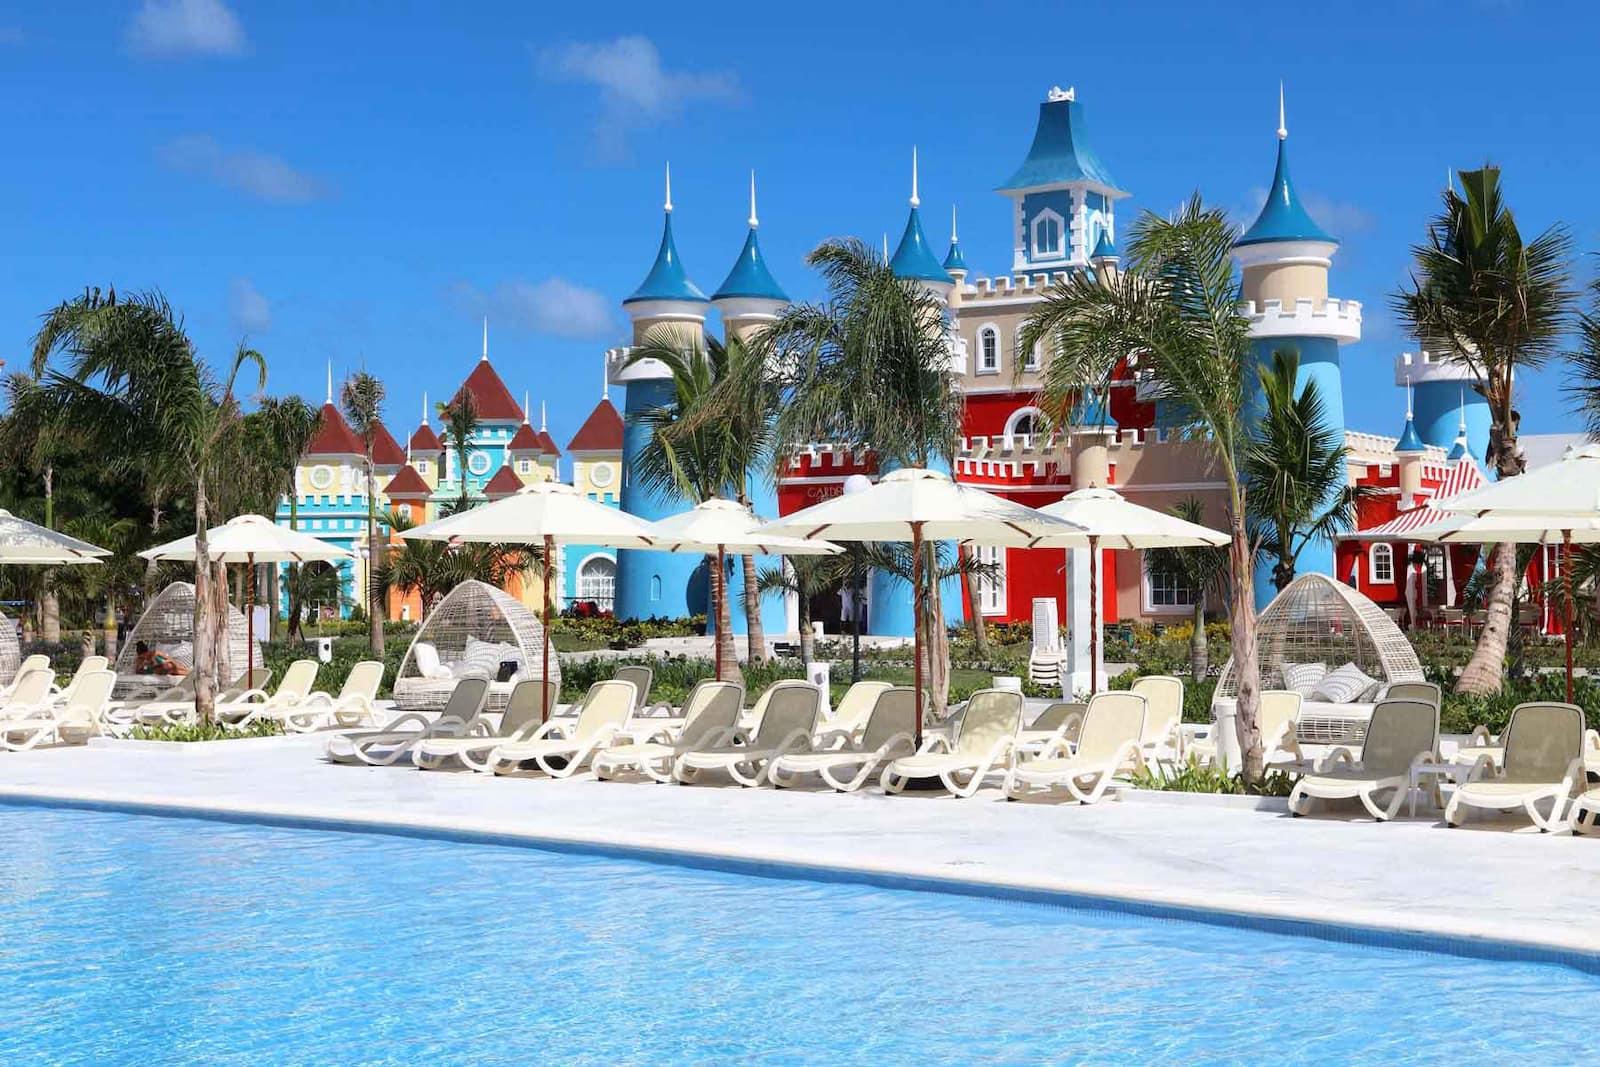 Luxury bahia principe fantasia bahia principe hotels for Hotel luxury bahia principe fantasia